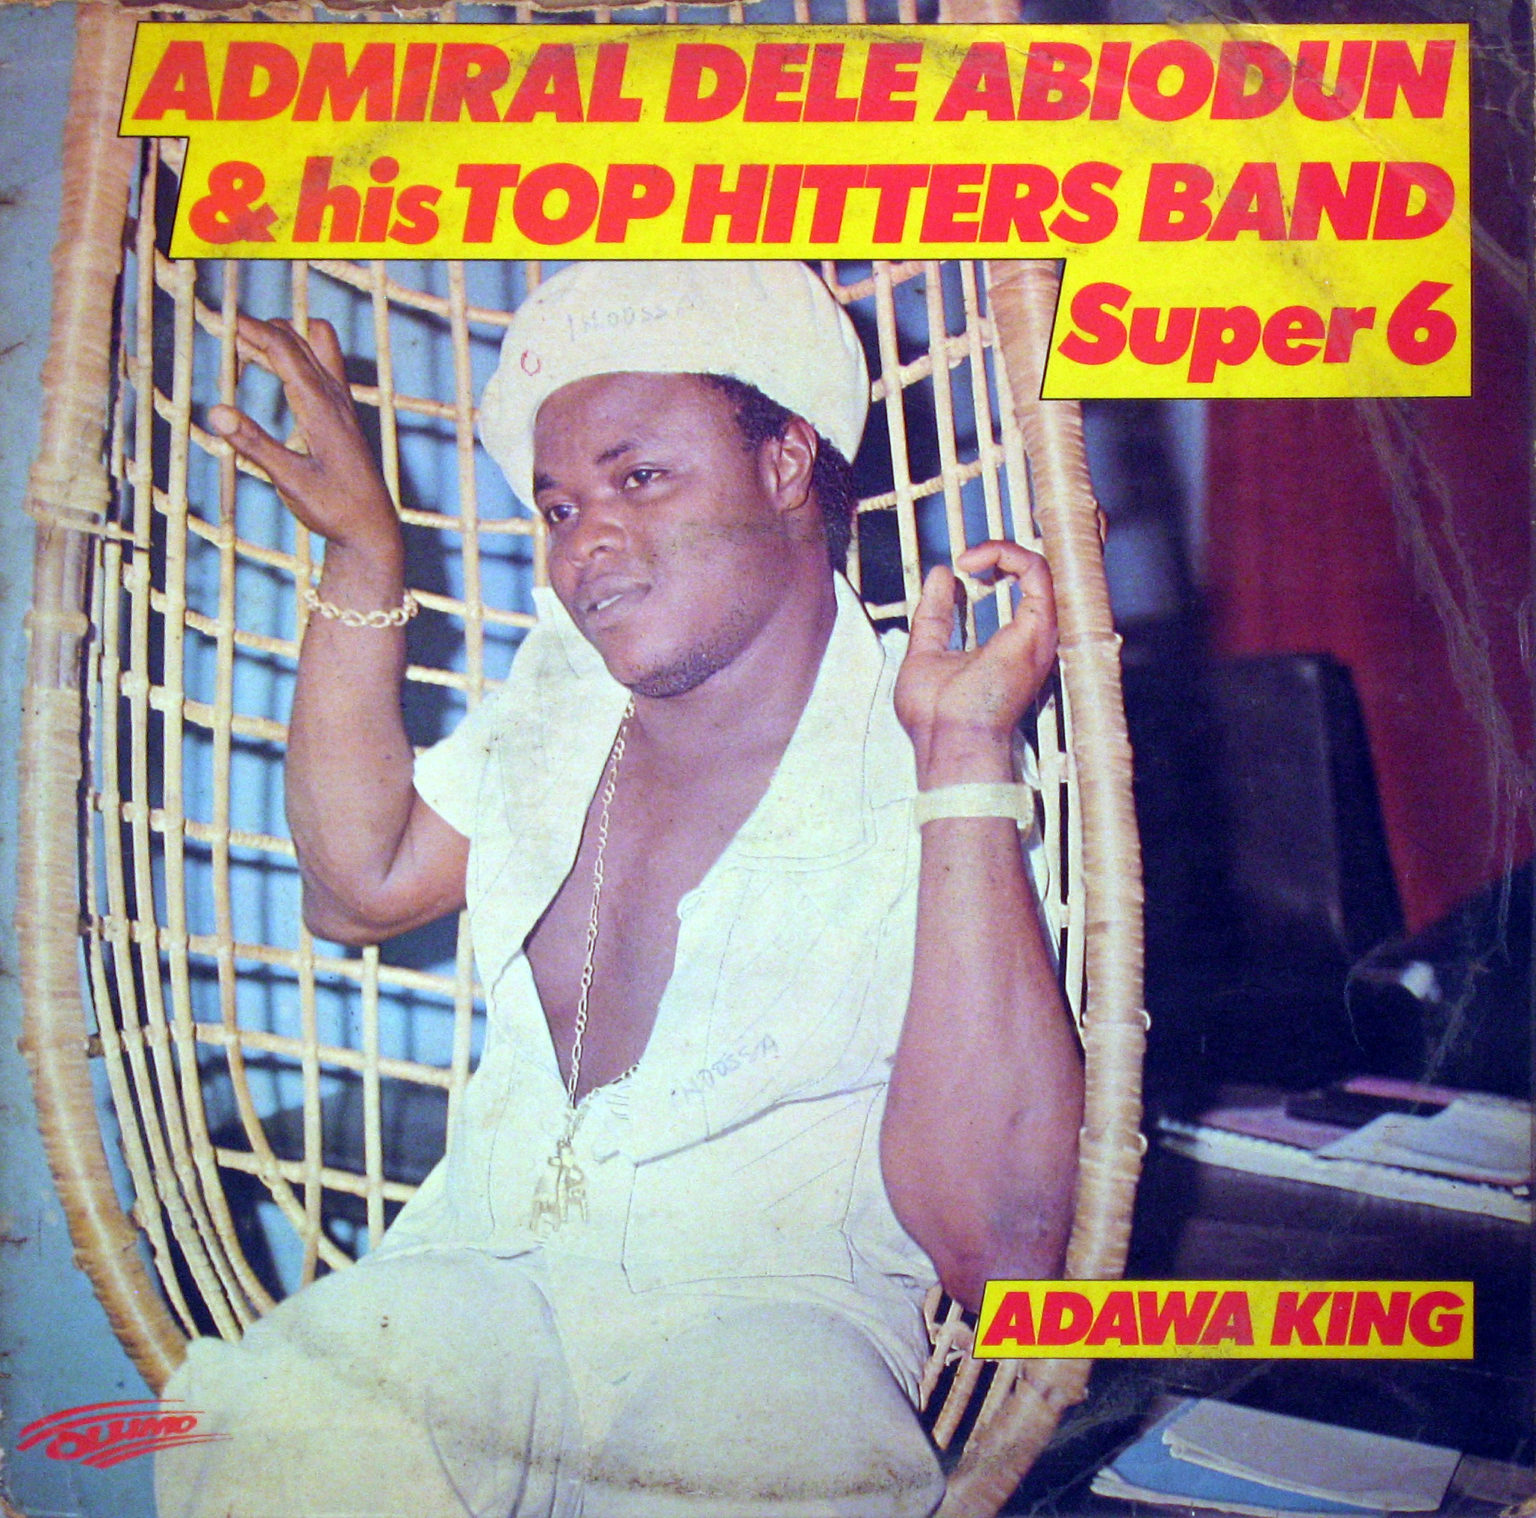 Admiral Dele Abiodun & His Top Hitters Band – Super 6 – Adawa King 70s NIGERIAN Juju Music ALBUM